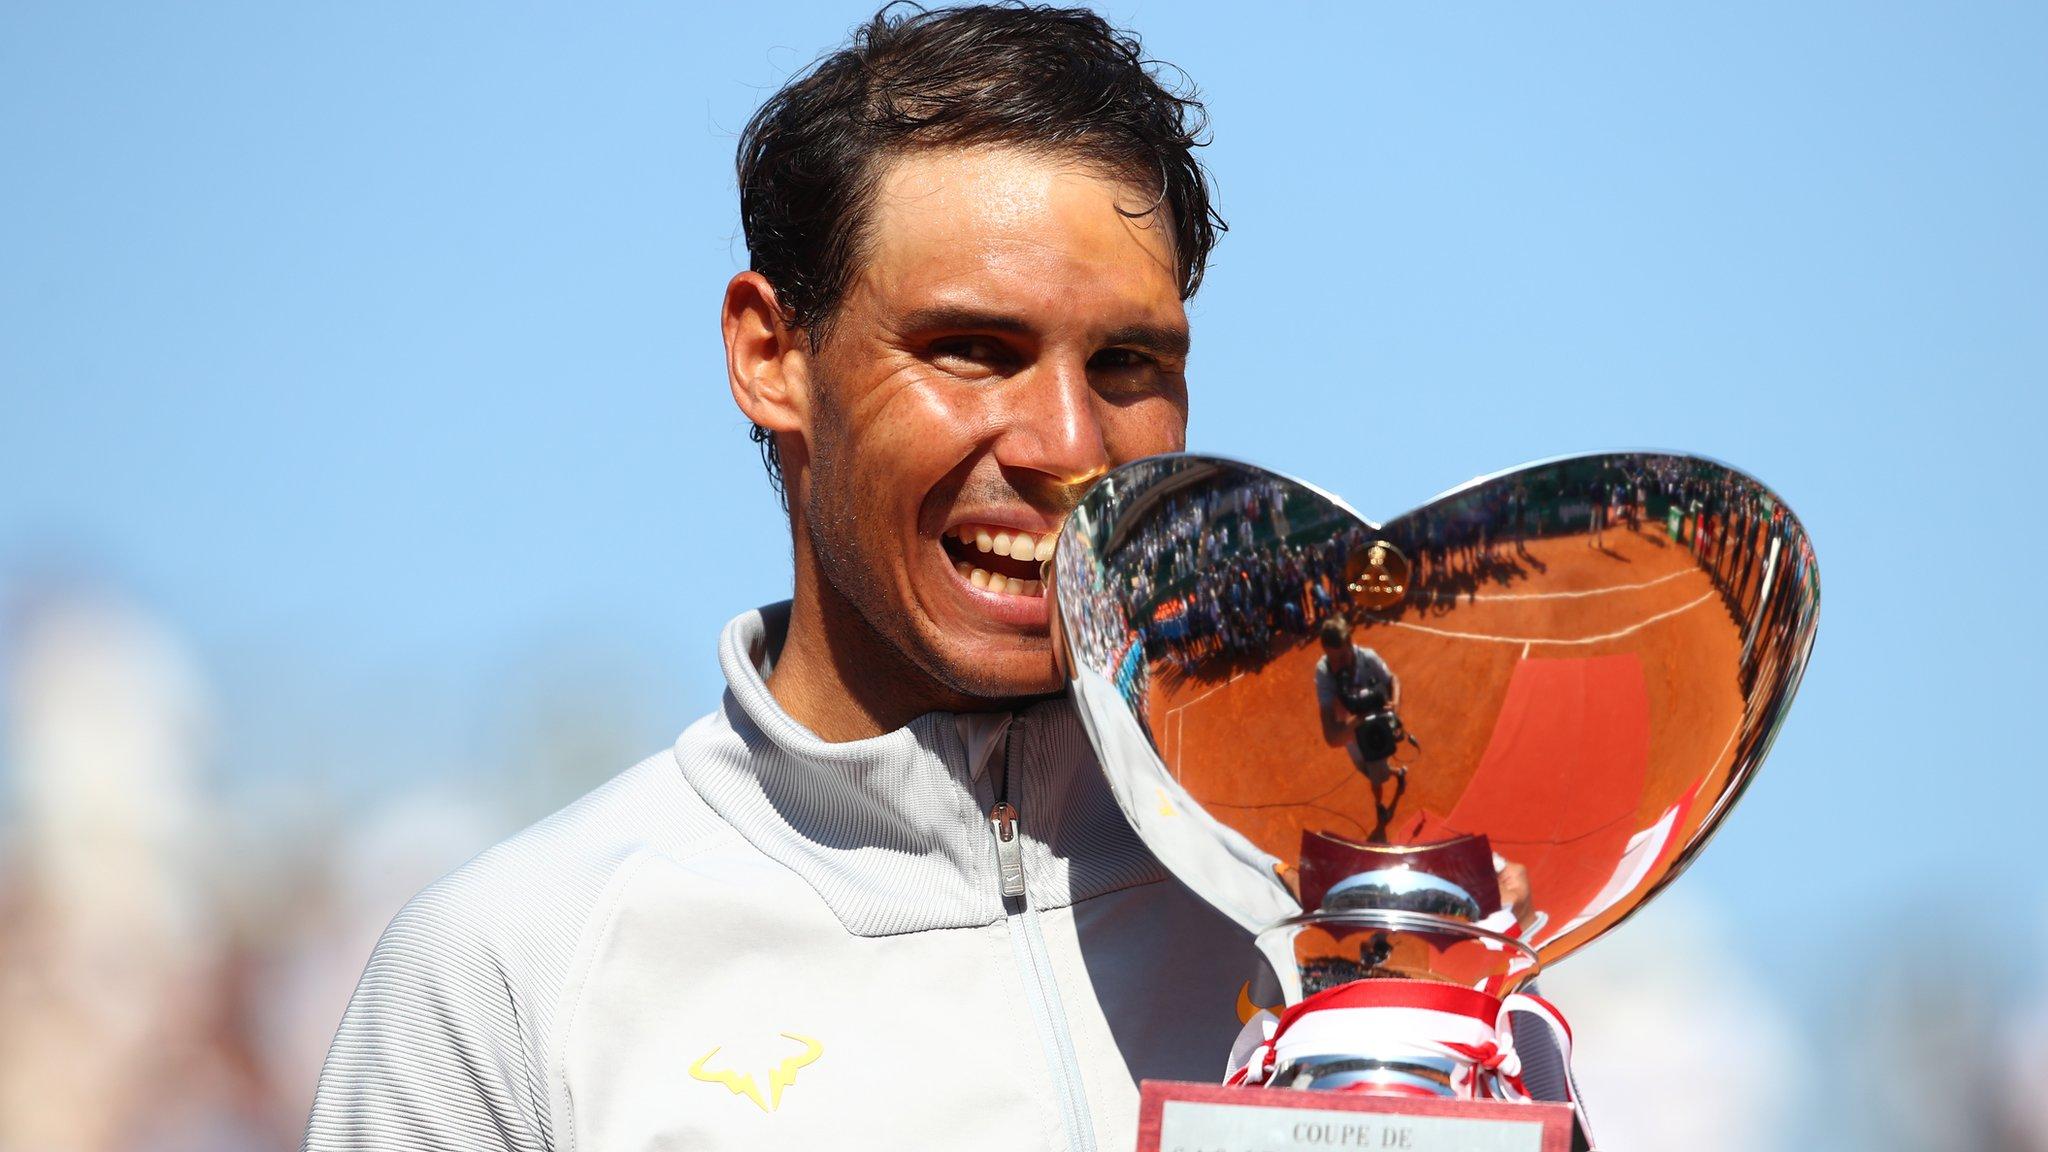 Monte Carlo Masters: Rafael Nadal stays world number one with final win over Kei Nishikori